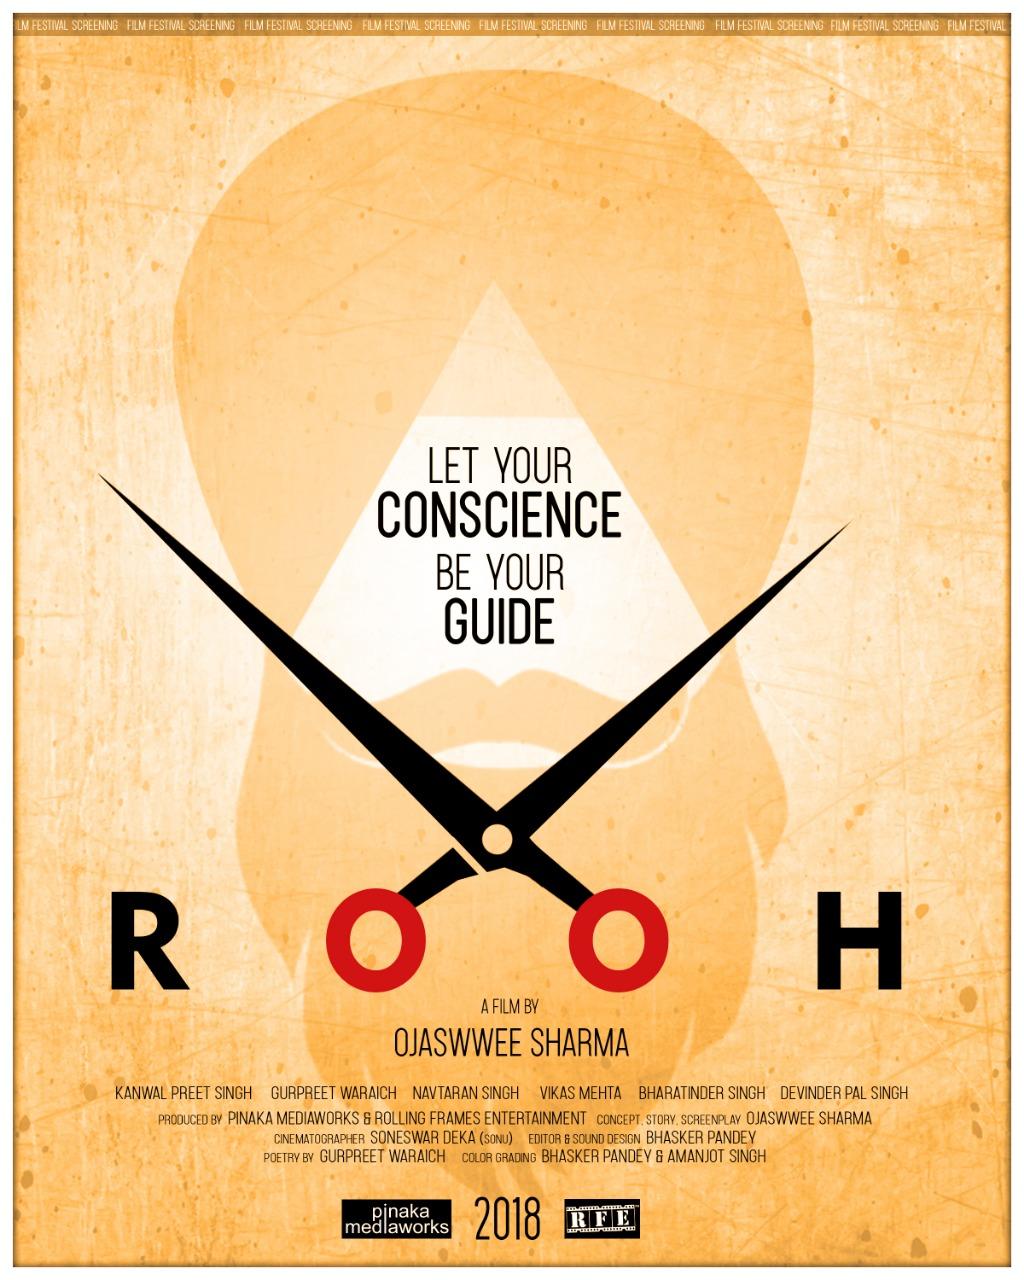 Rooh (2020)